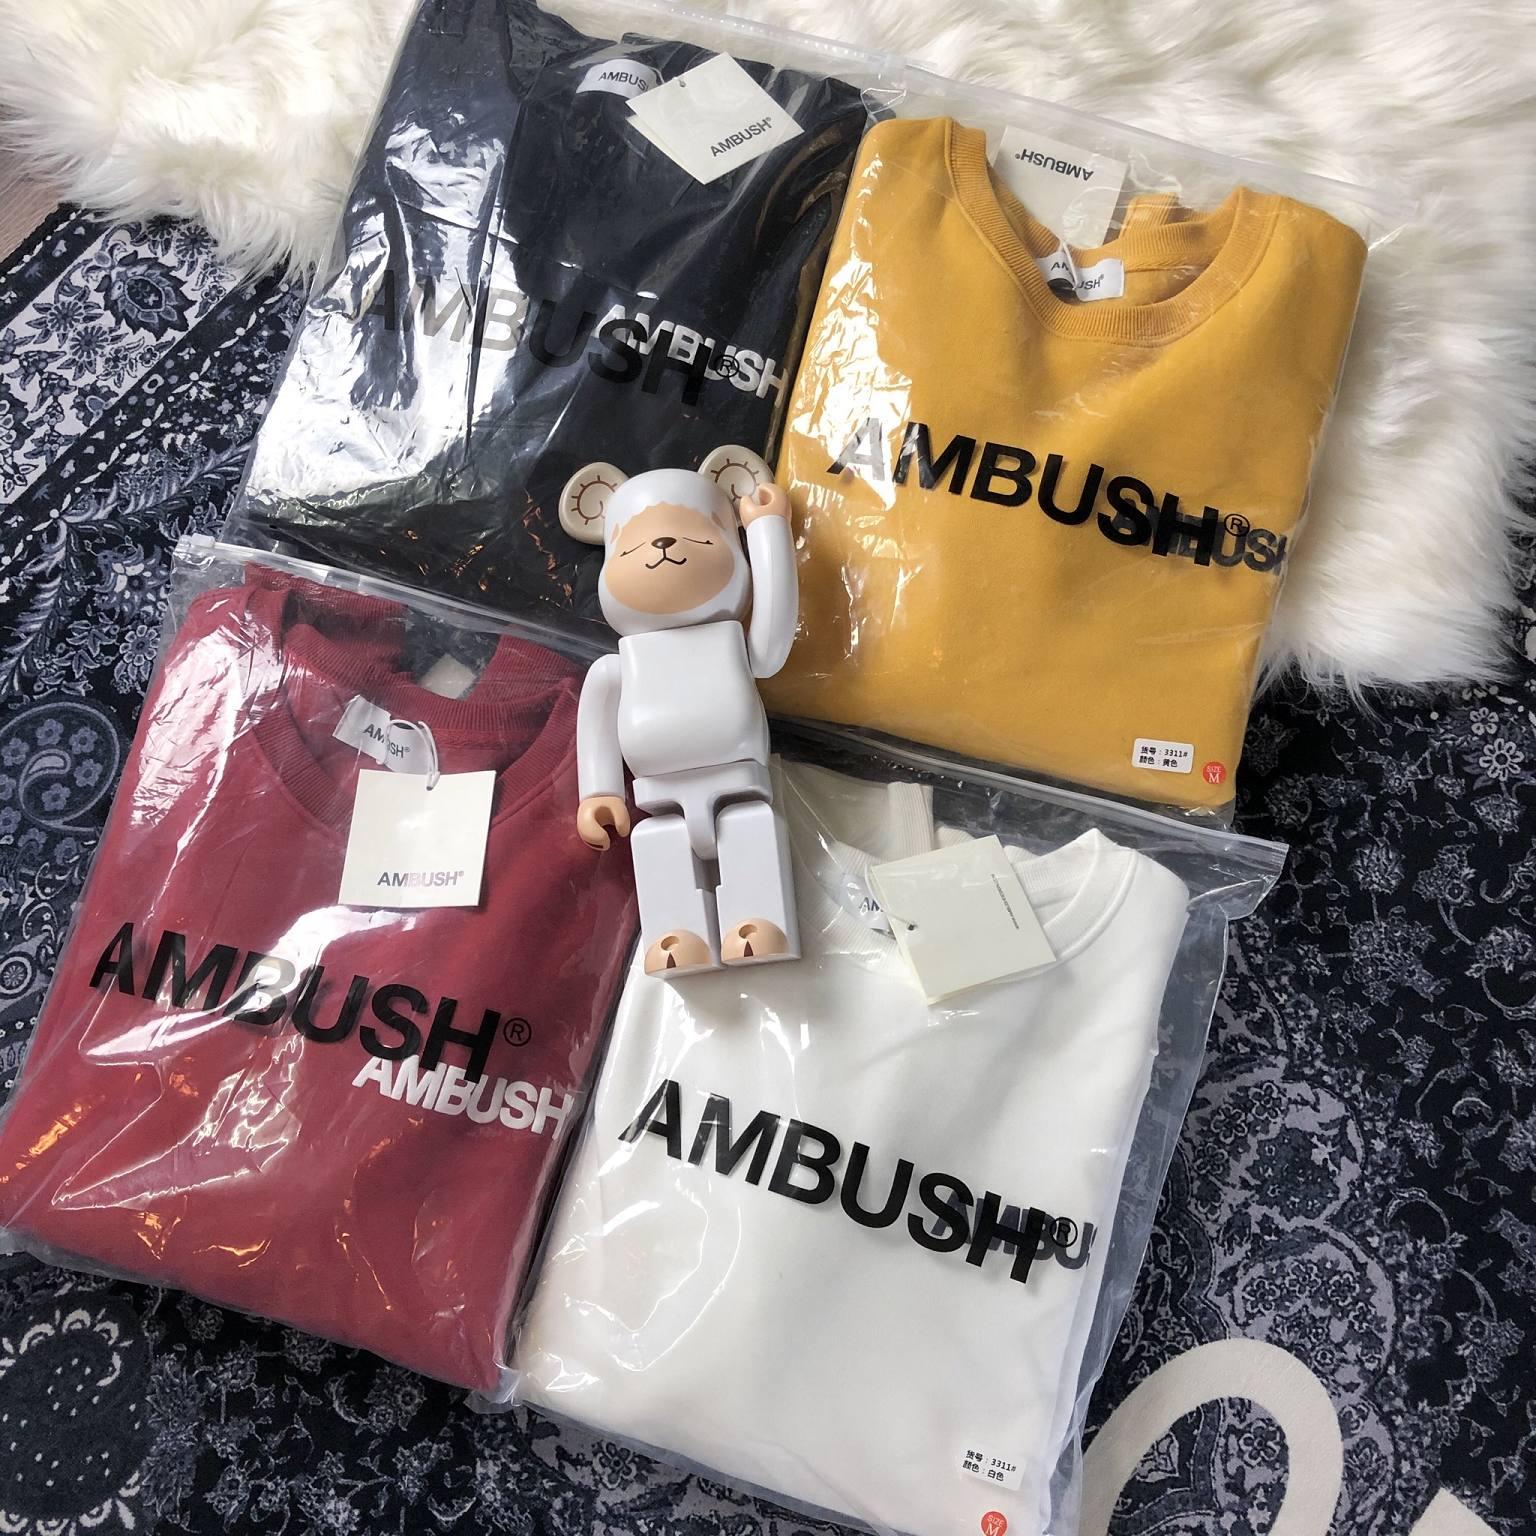 19ss Ambush Hoodies Men Women 3D Print Streetwear Hip Hop Ambush Sweatshirts Kanye West Skateboard  Ambush Pullover